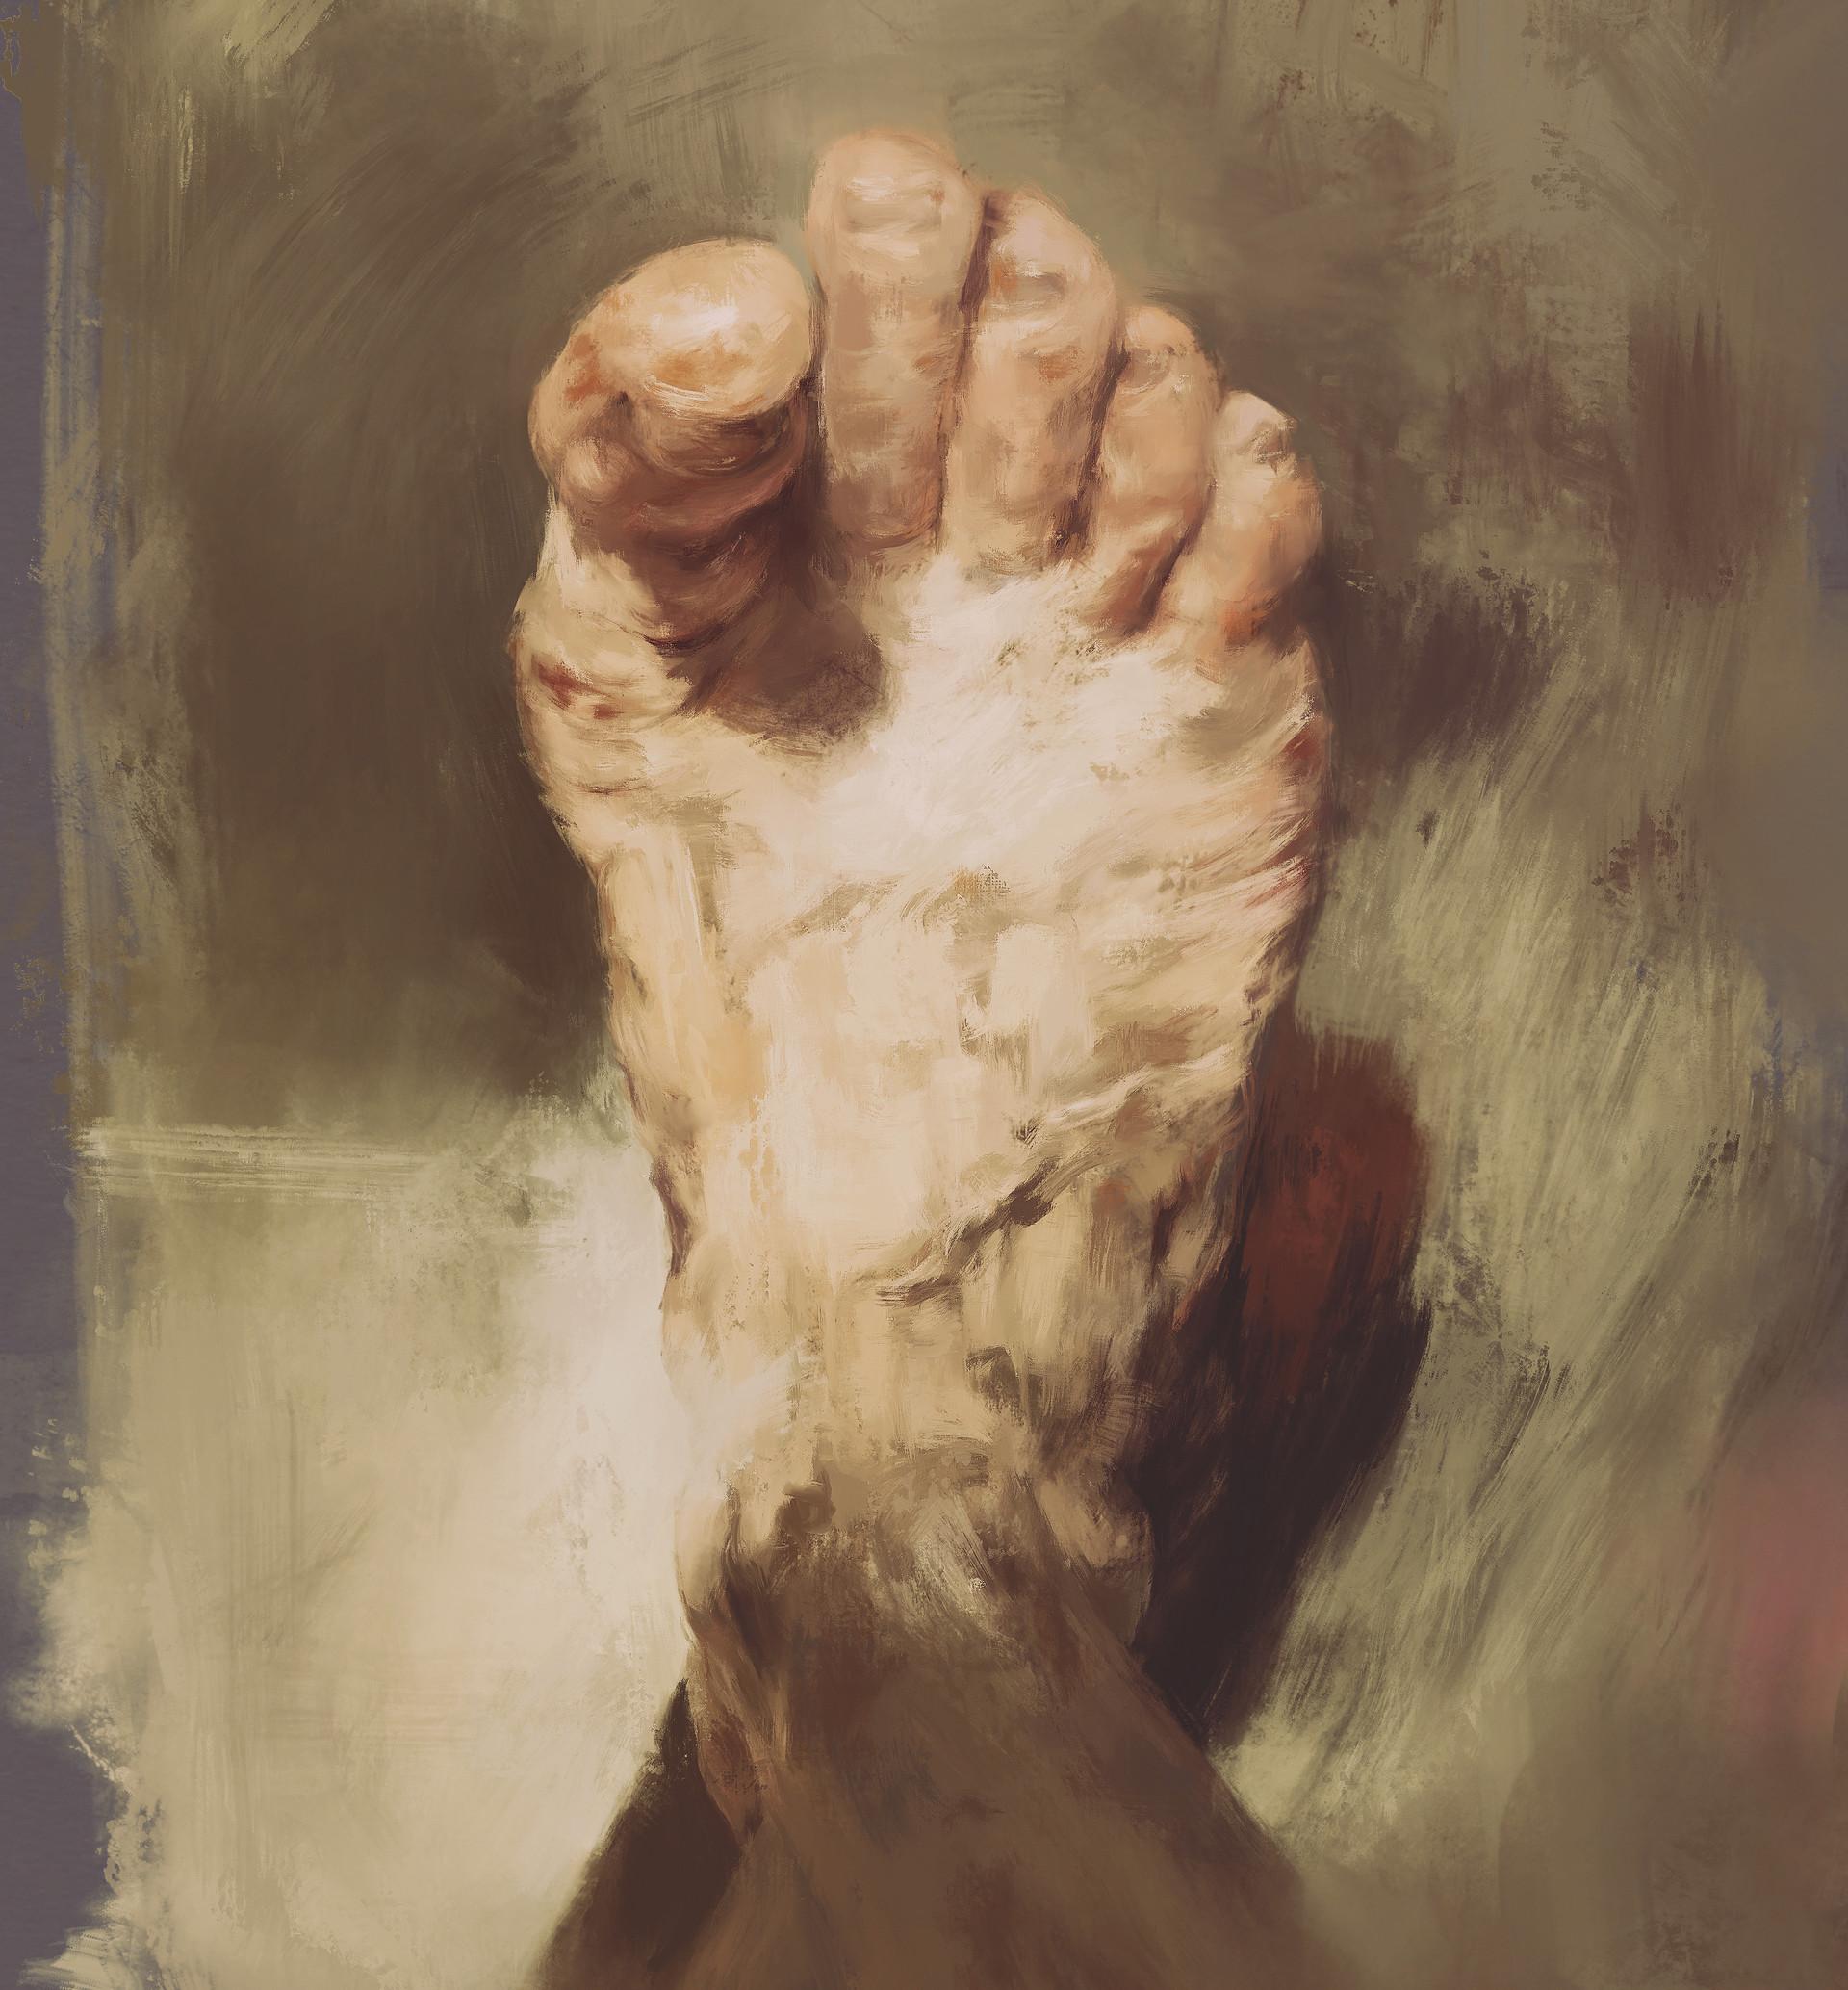 arash-razavi-foot-of-the-painter